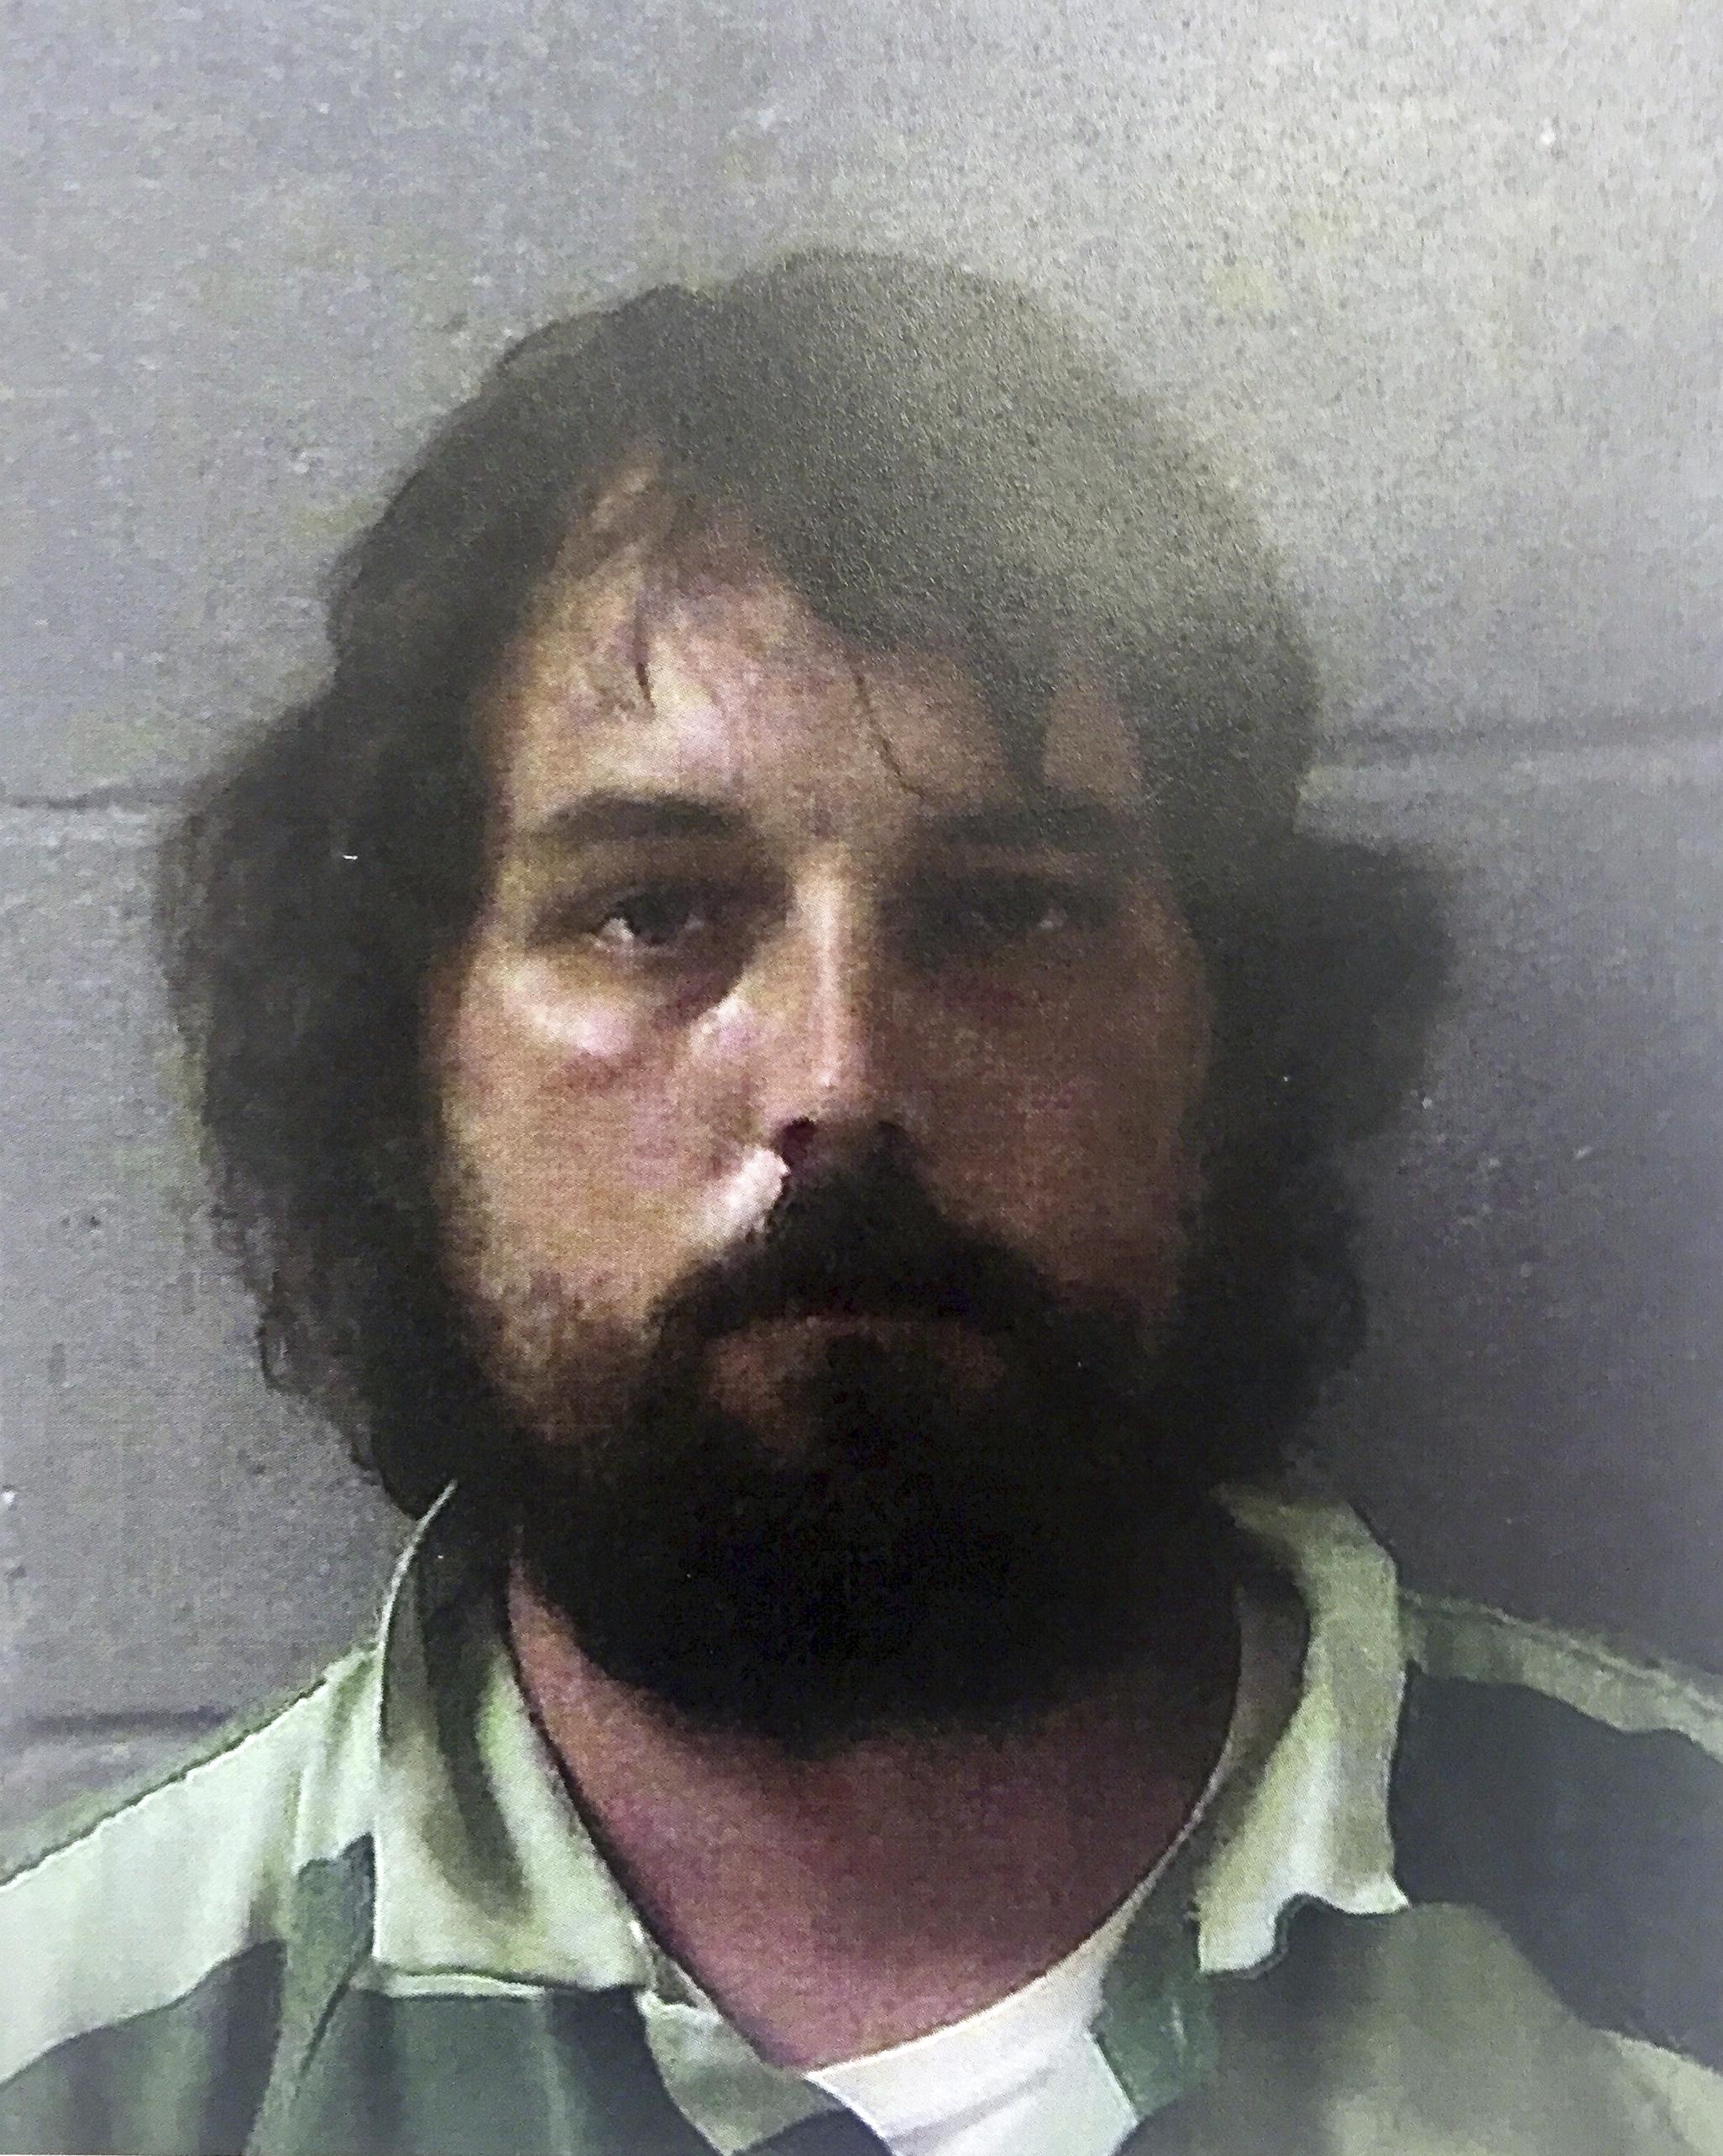 Ryan Alexander Duke, in Georgia on Feb 22, 2017. (Georgia Bureau of Investigation via AP)